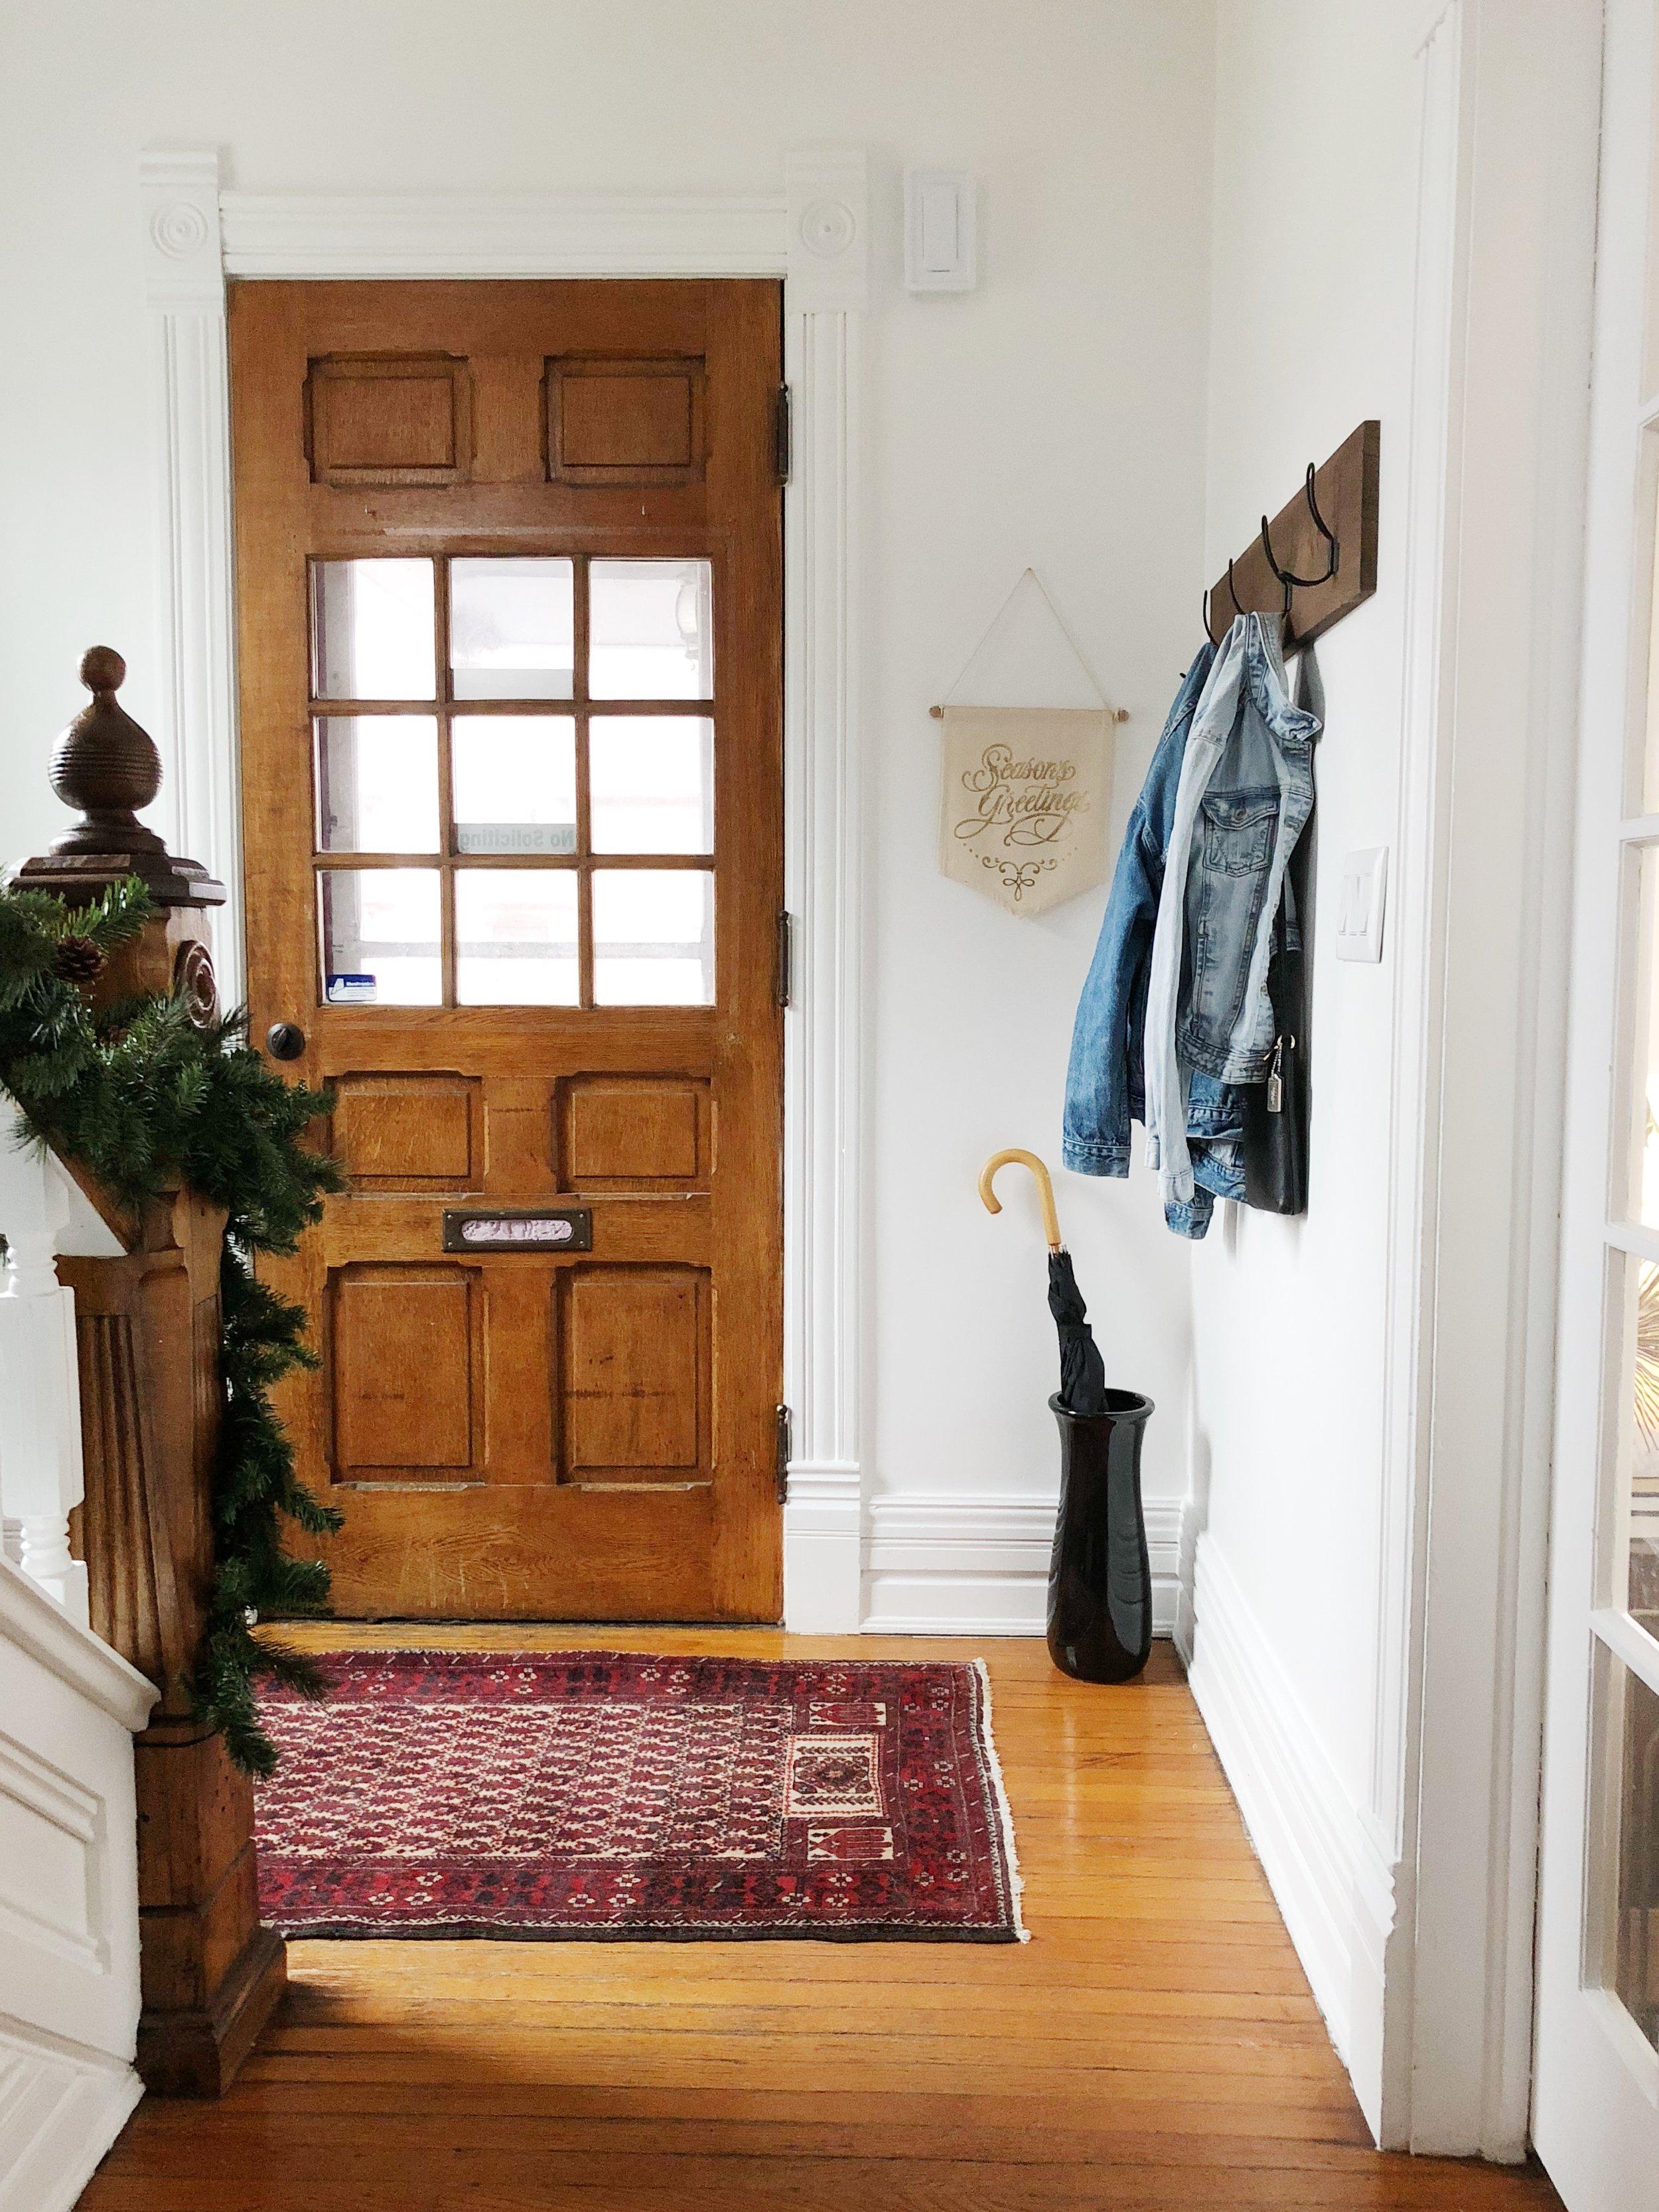 Holiday Entryway Season Greetings Wood Front Door Persian Rug Coat Rack